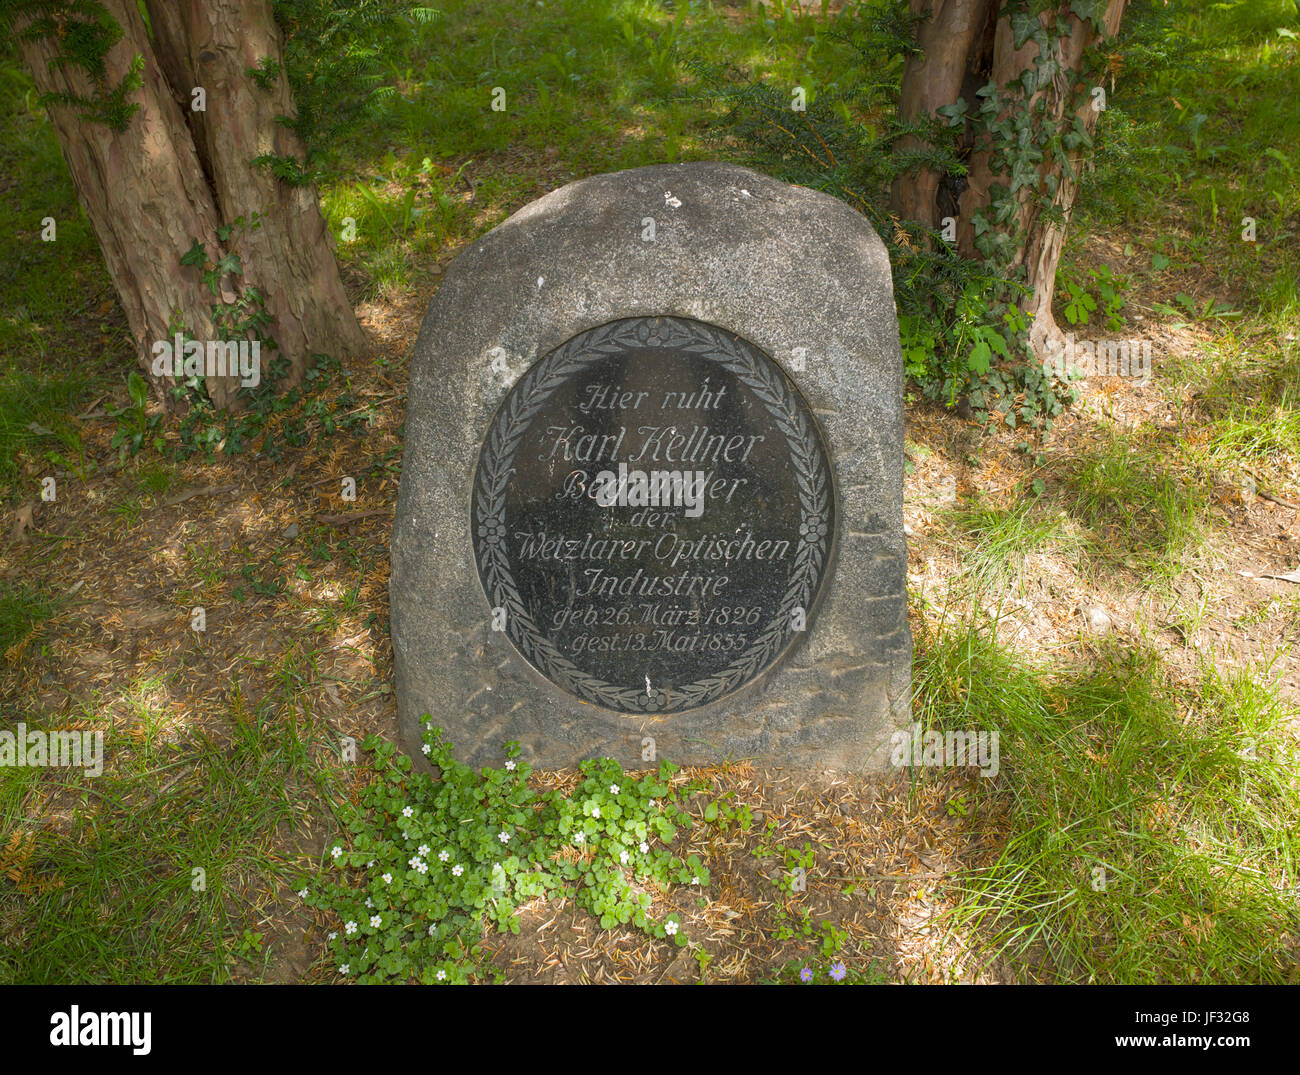 Gravestone of Karl Kellner, Wetzlar, Germany - Stock Image